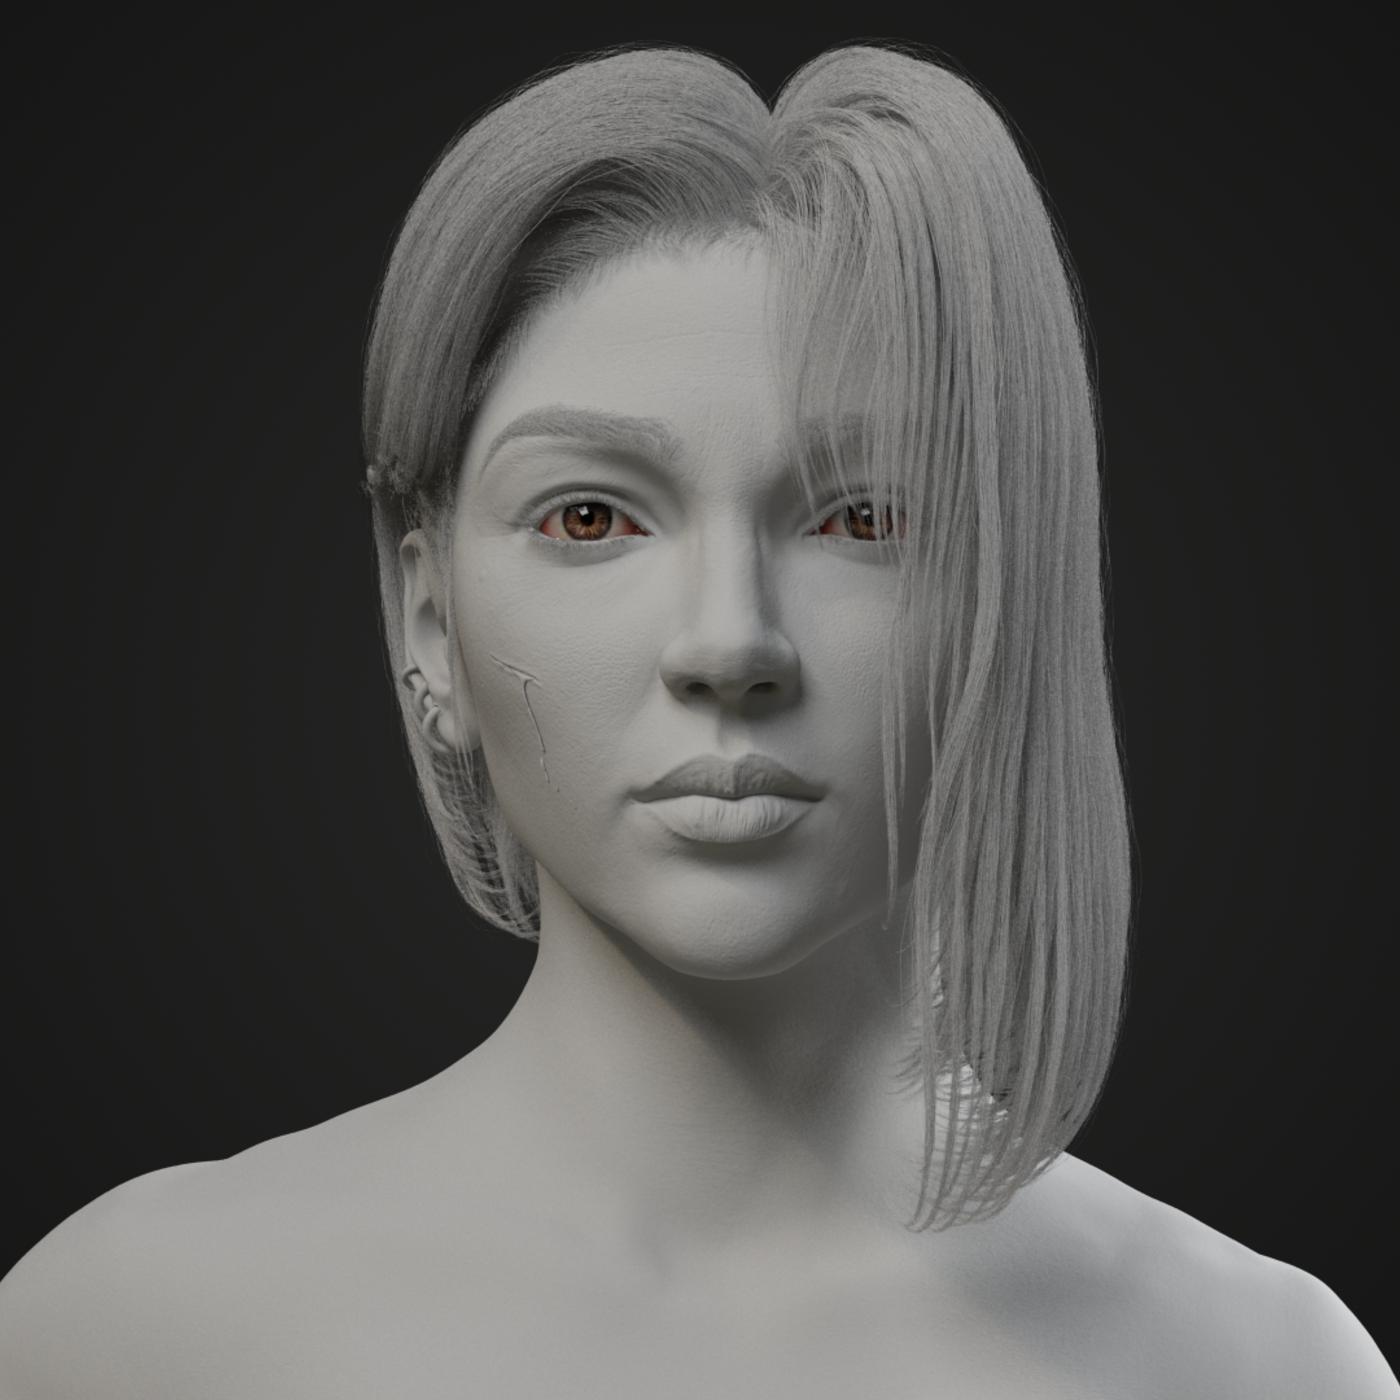 Photorealistic Warrior Girl